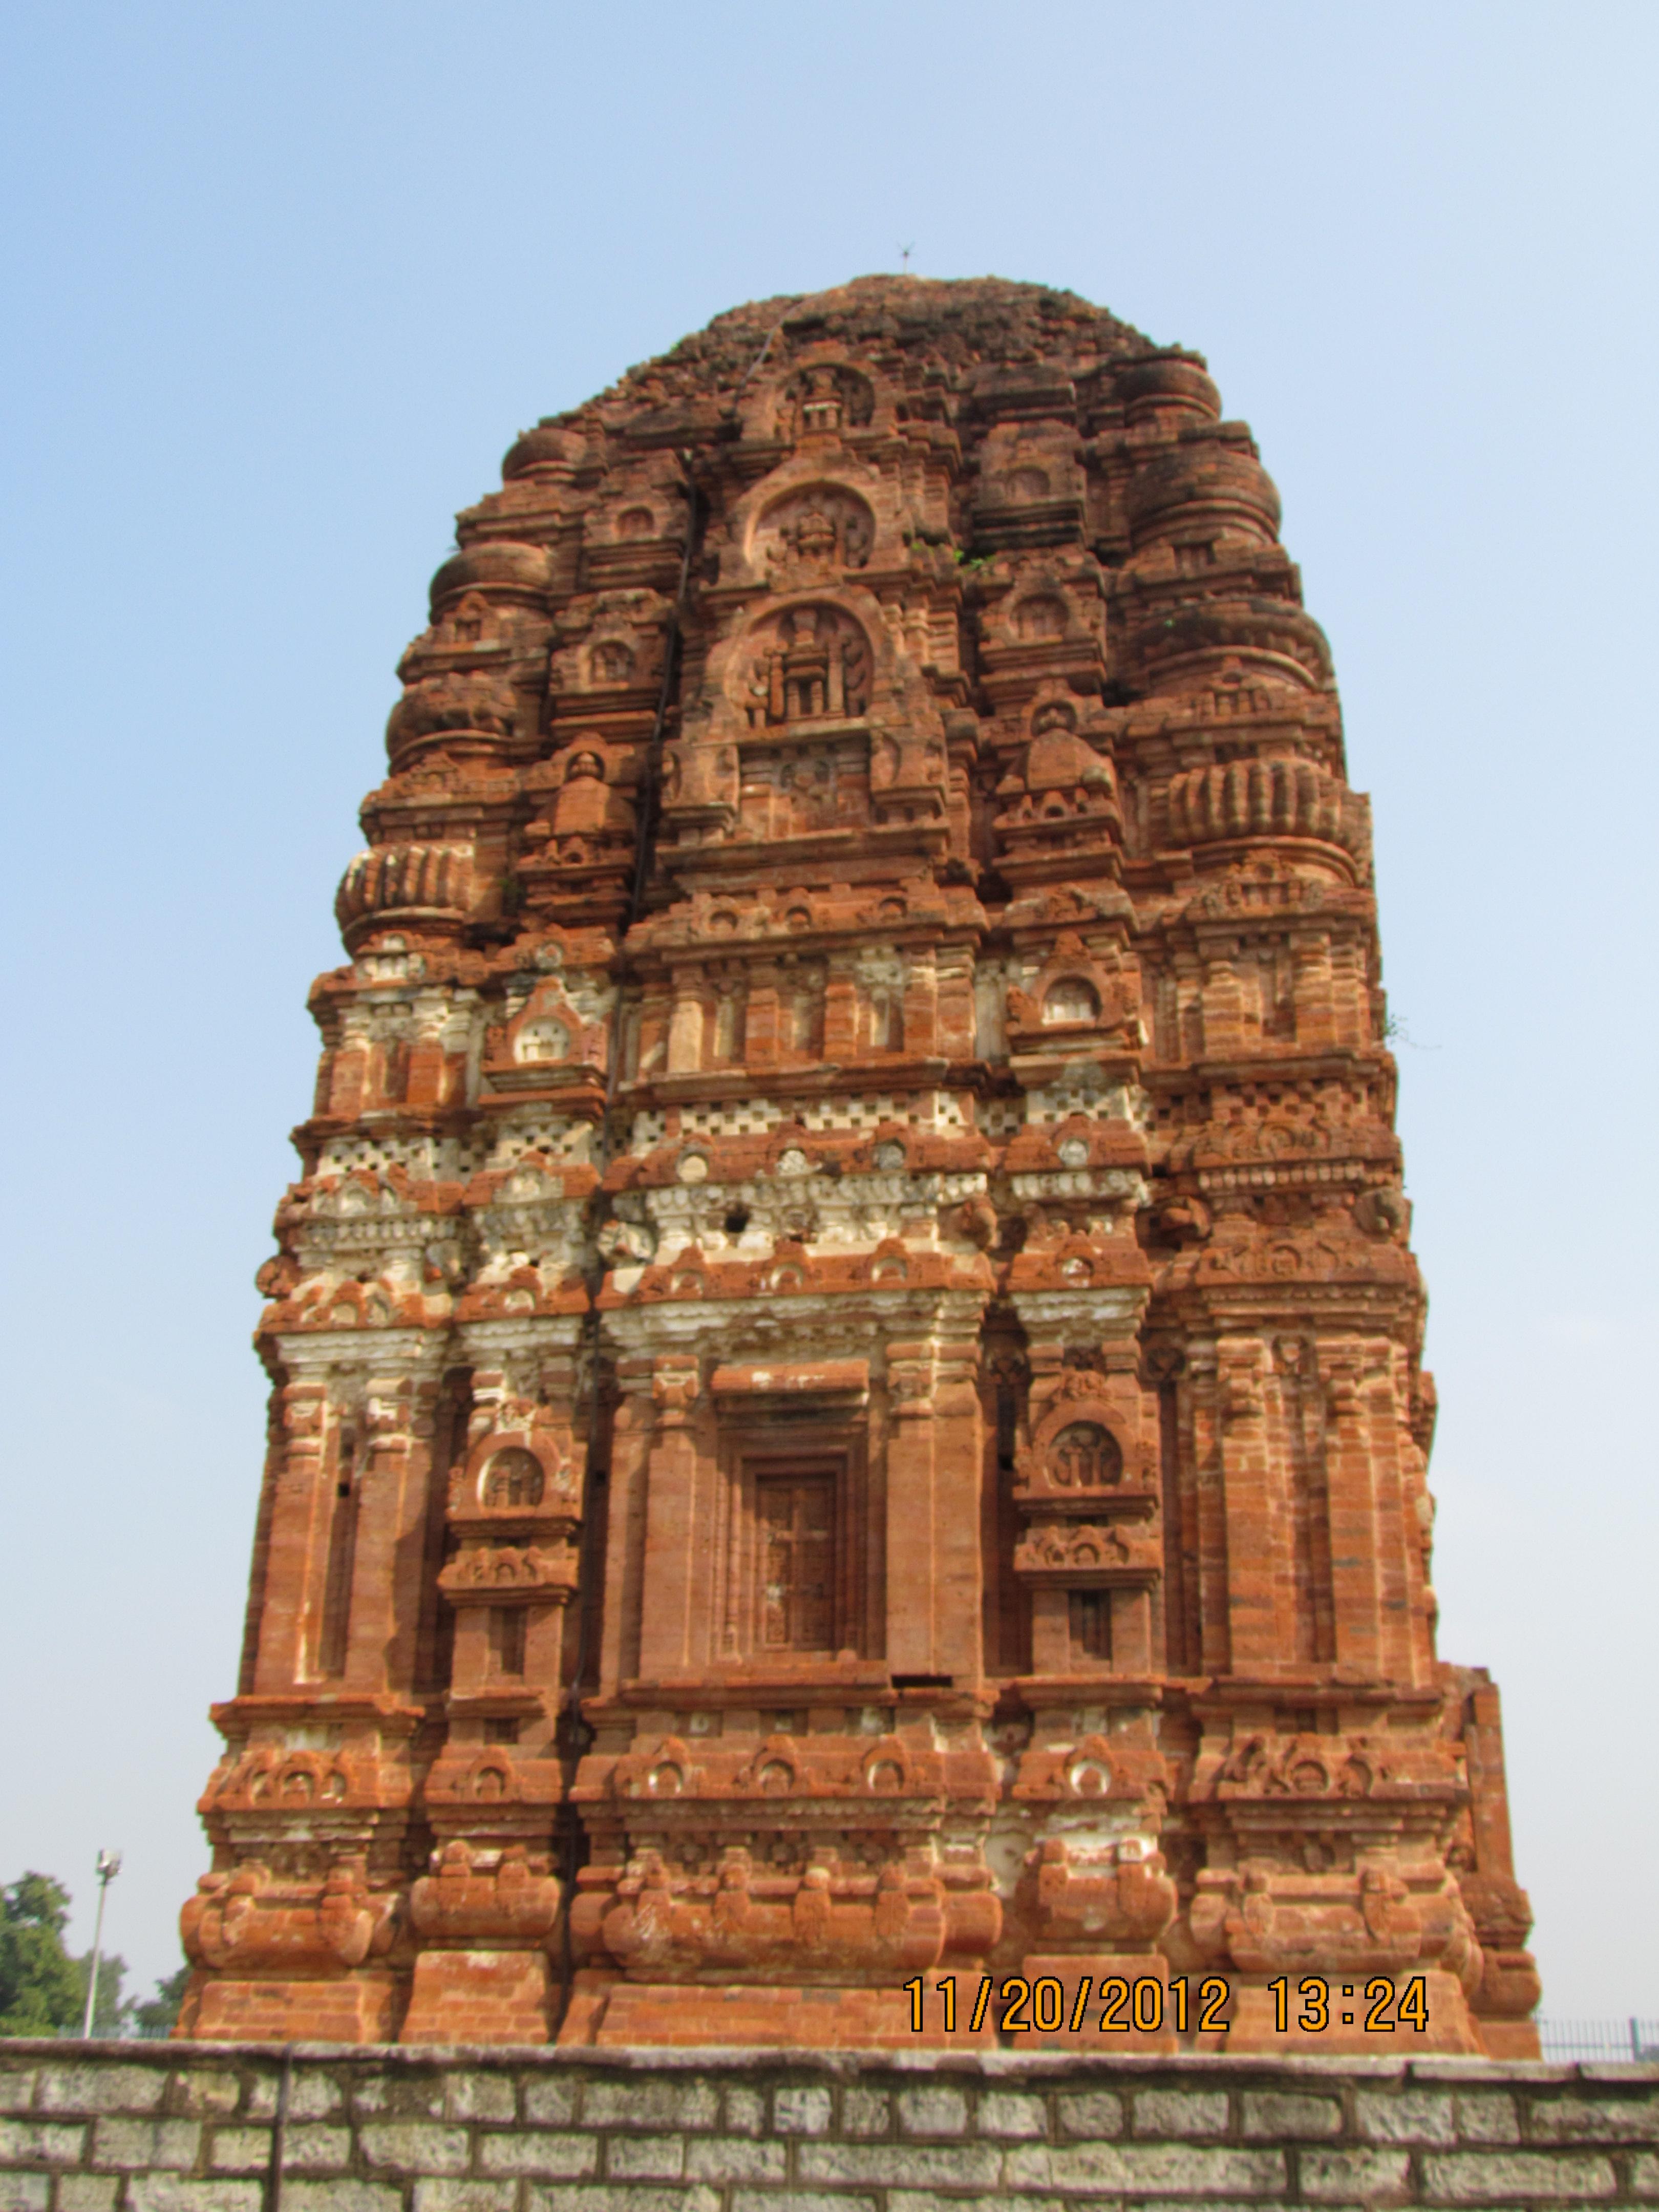 Sirpur Lakshman temple